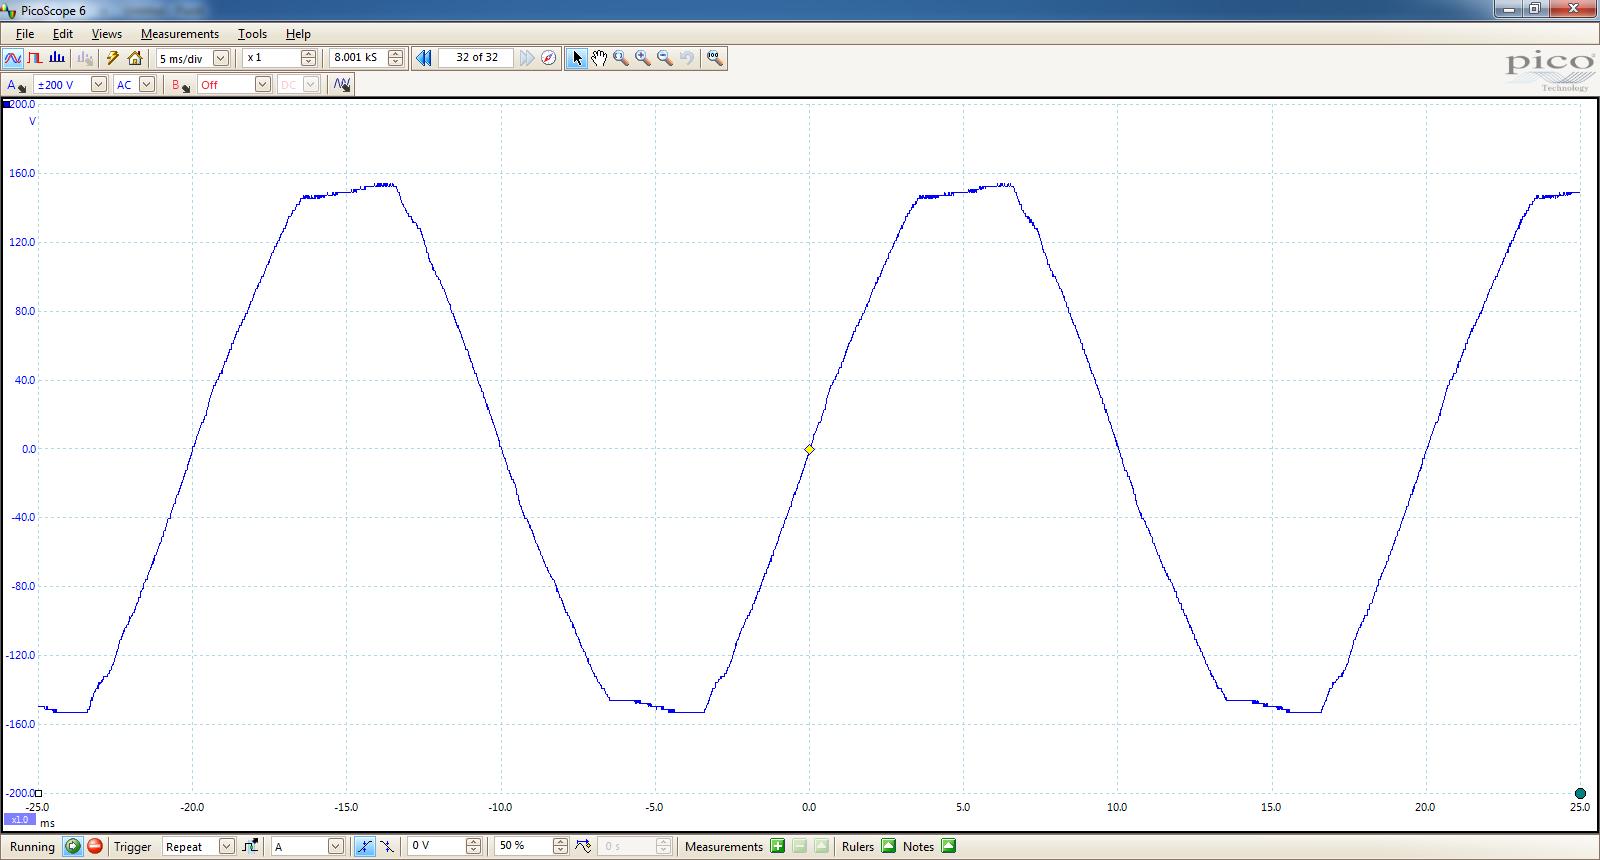 Mains_outlet+SMPS_sine_01.png